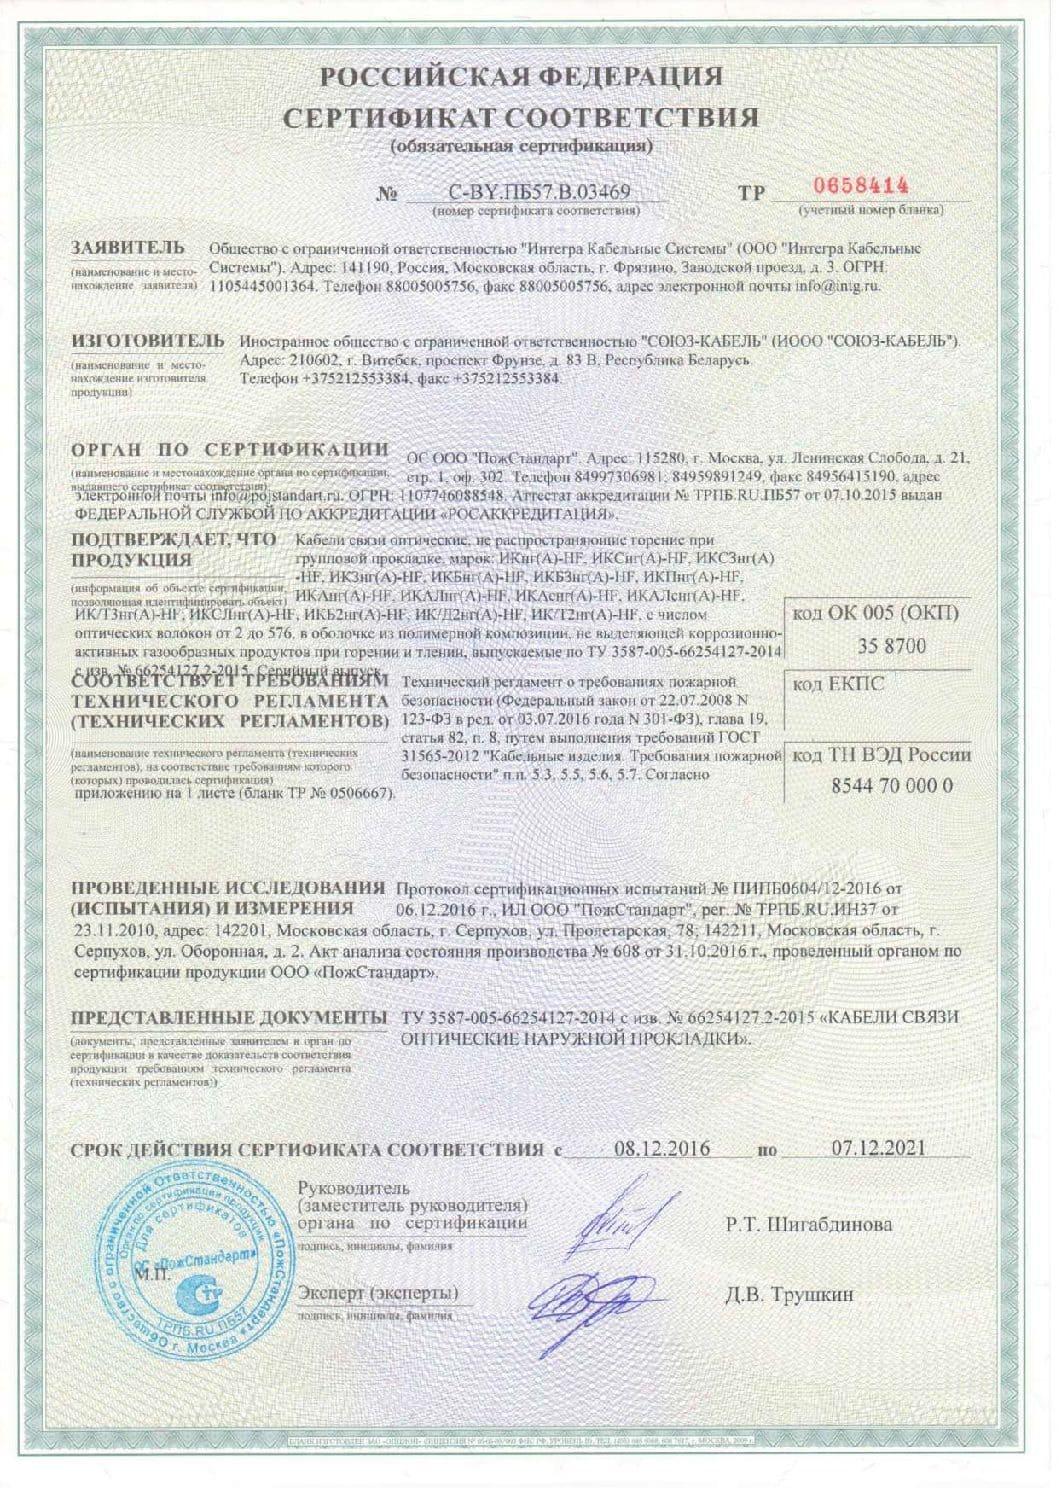 fire-certificate-cbypb57b03469-ngahf